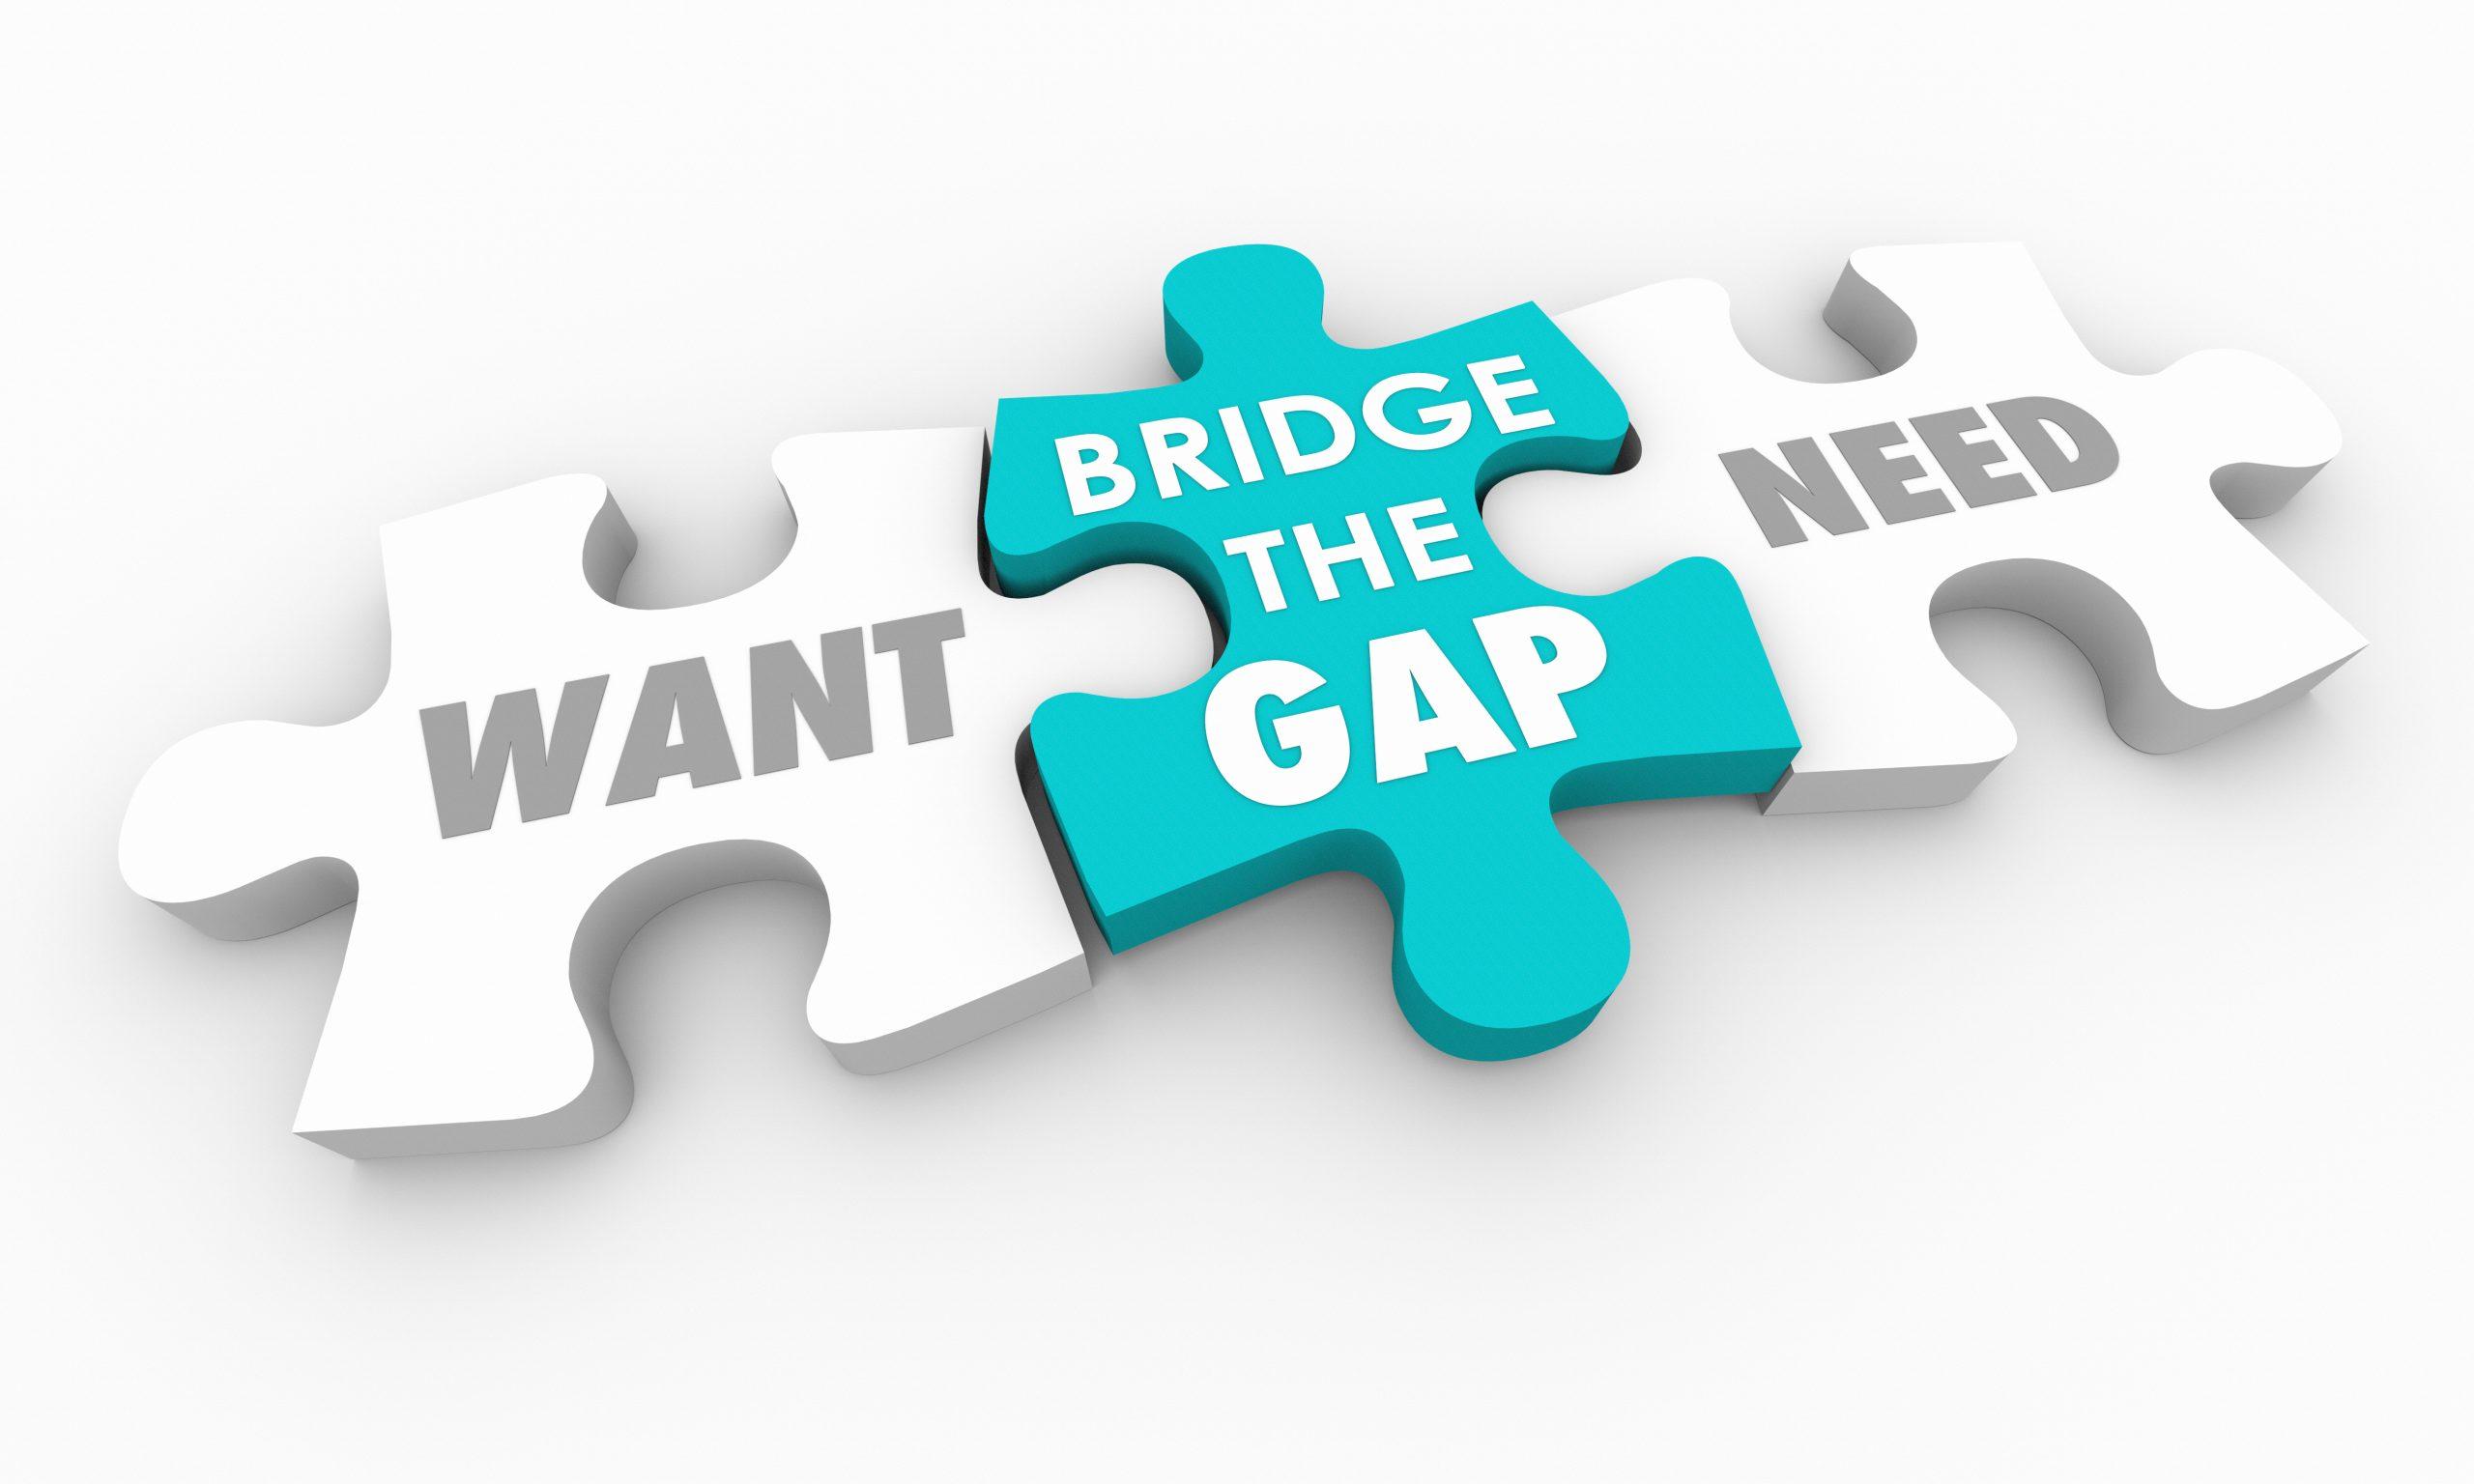 Want Vs Need Bridge the Gap Puzzle Pieces 3d Illustration